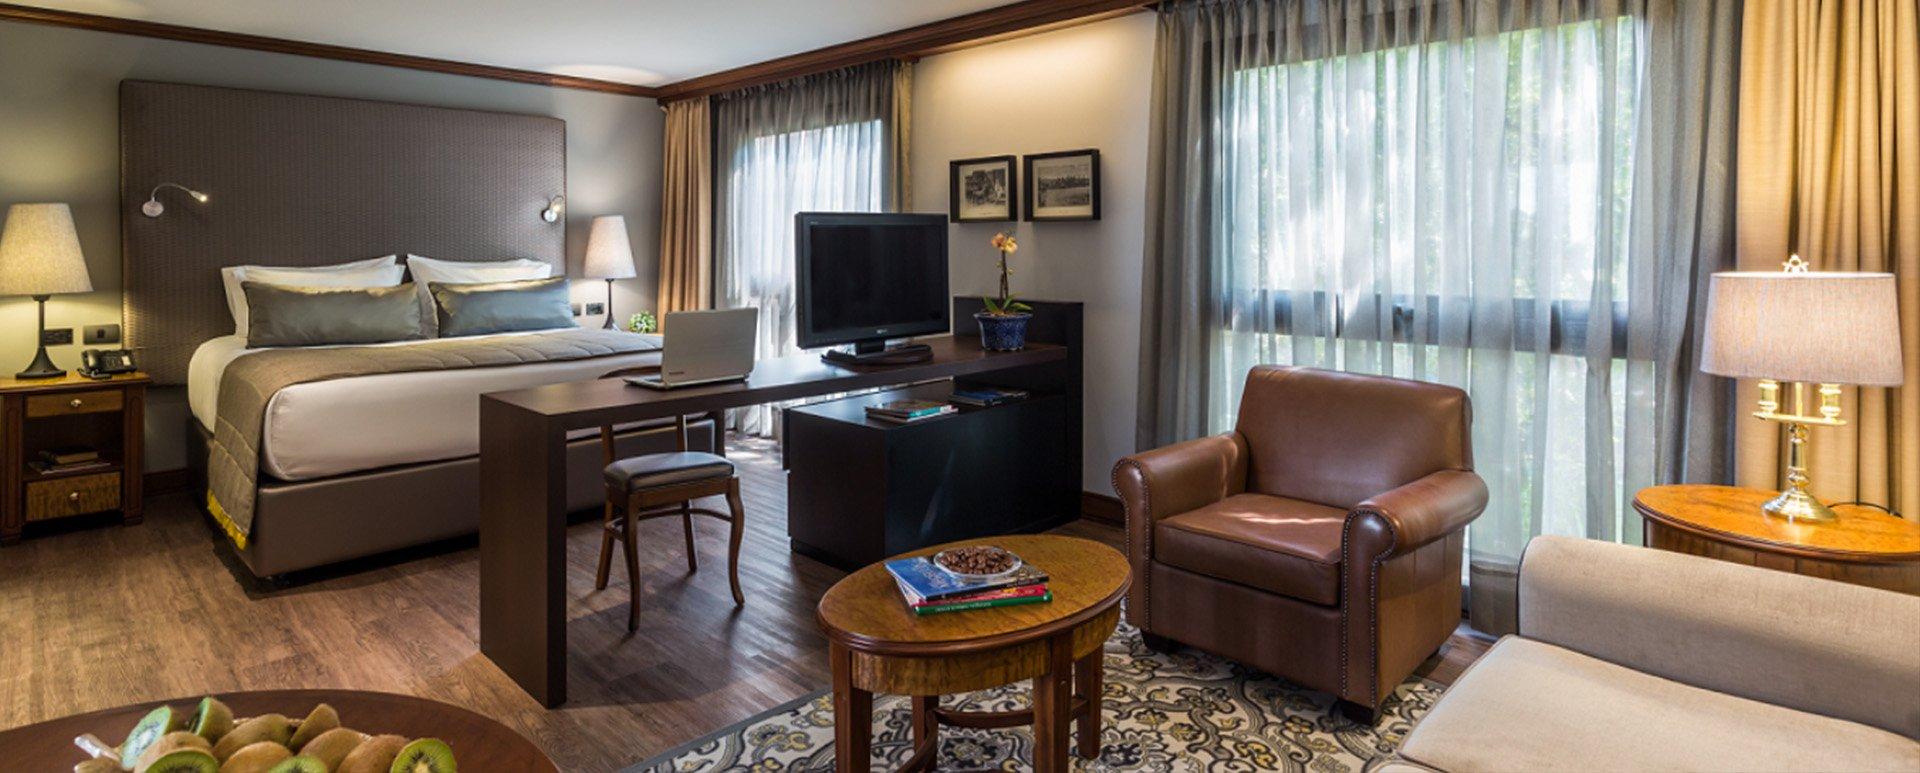 Hotel Park 10 Medellin room